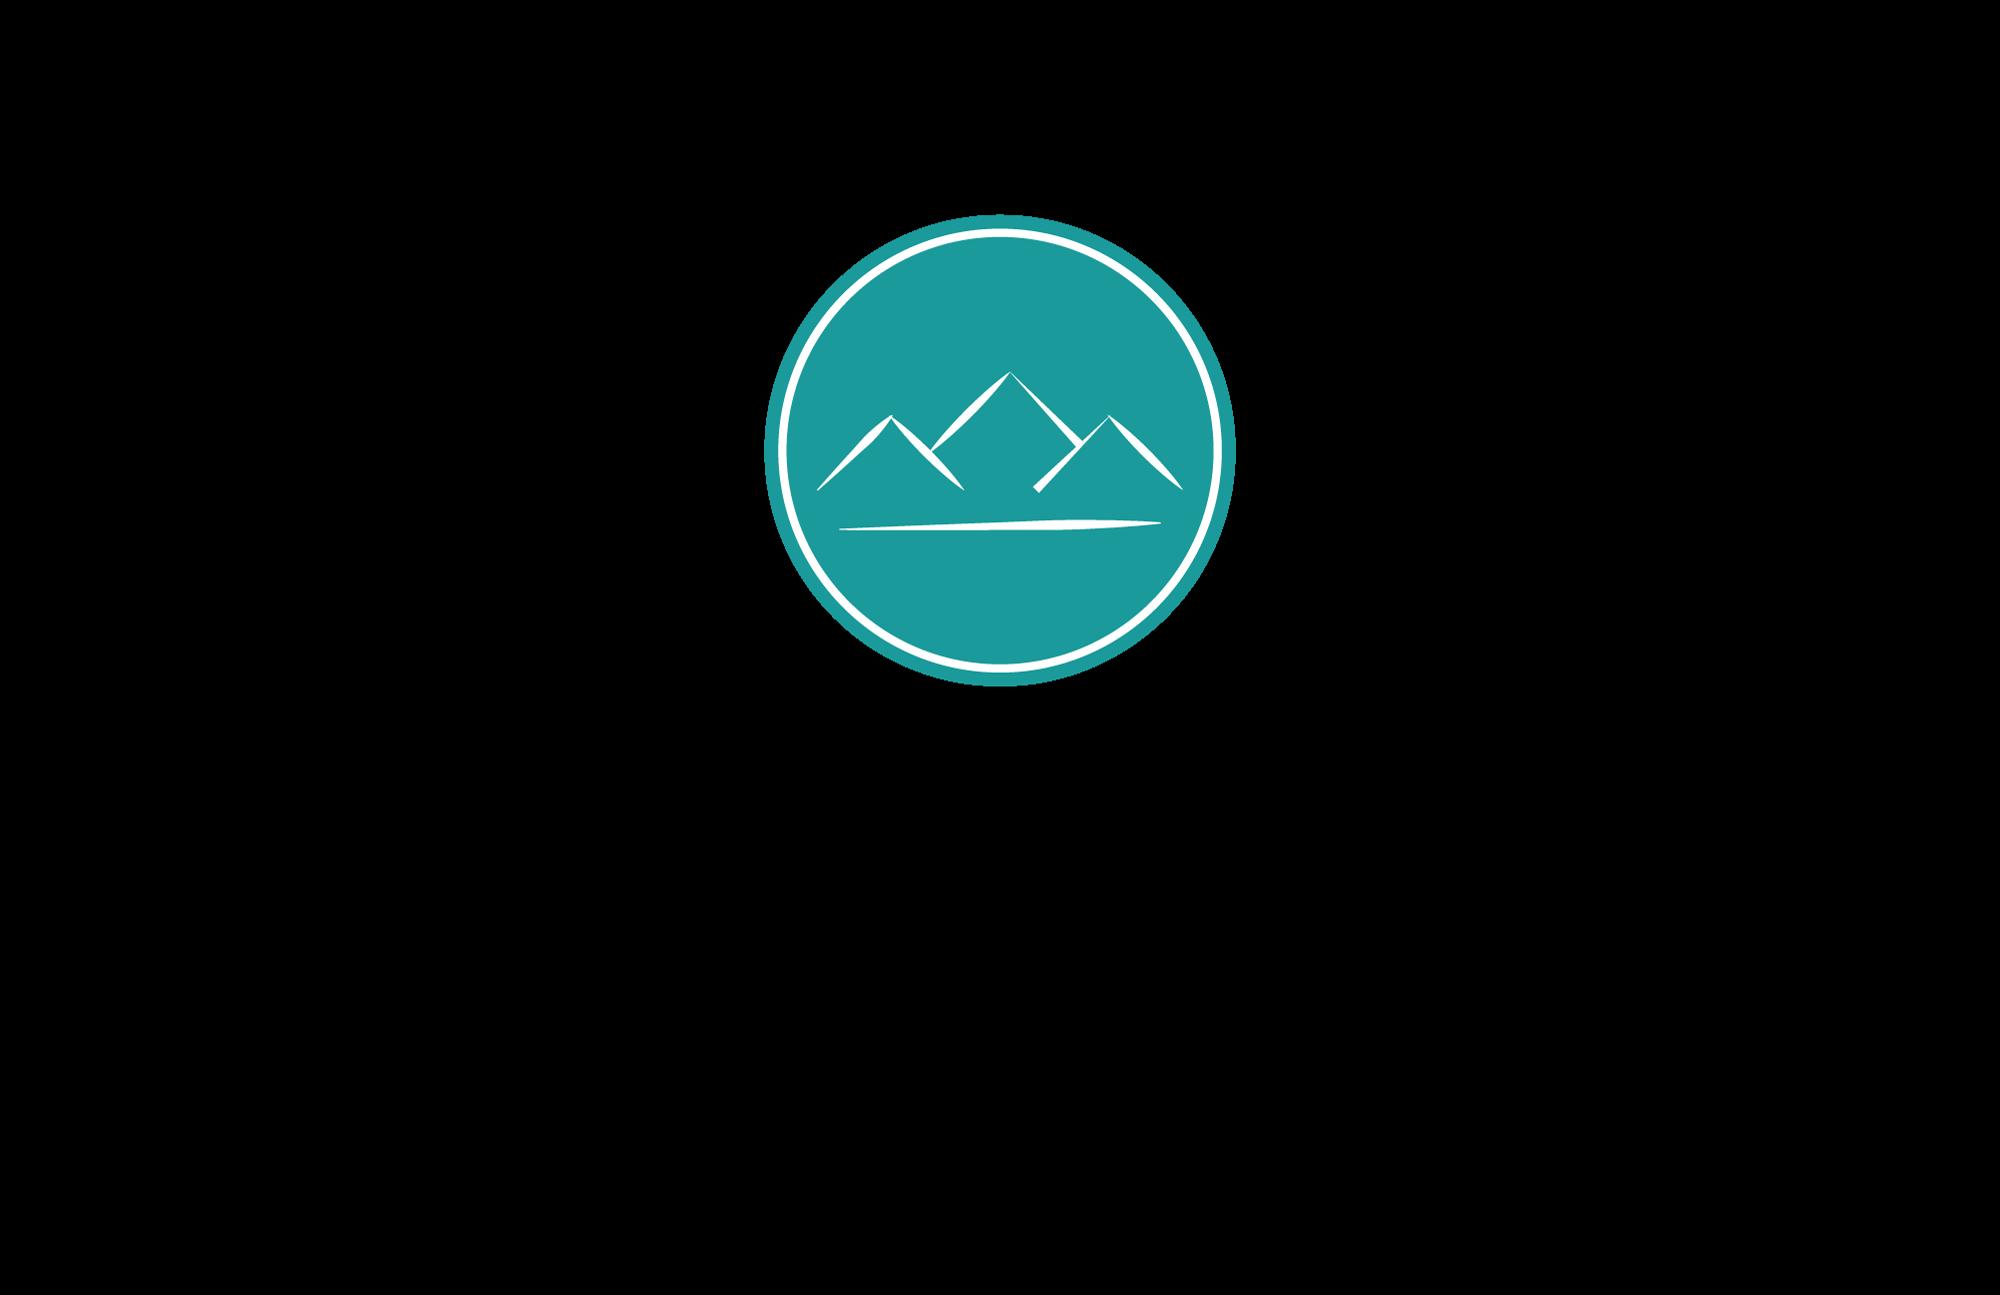 Logos-Lars-May-3